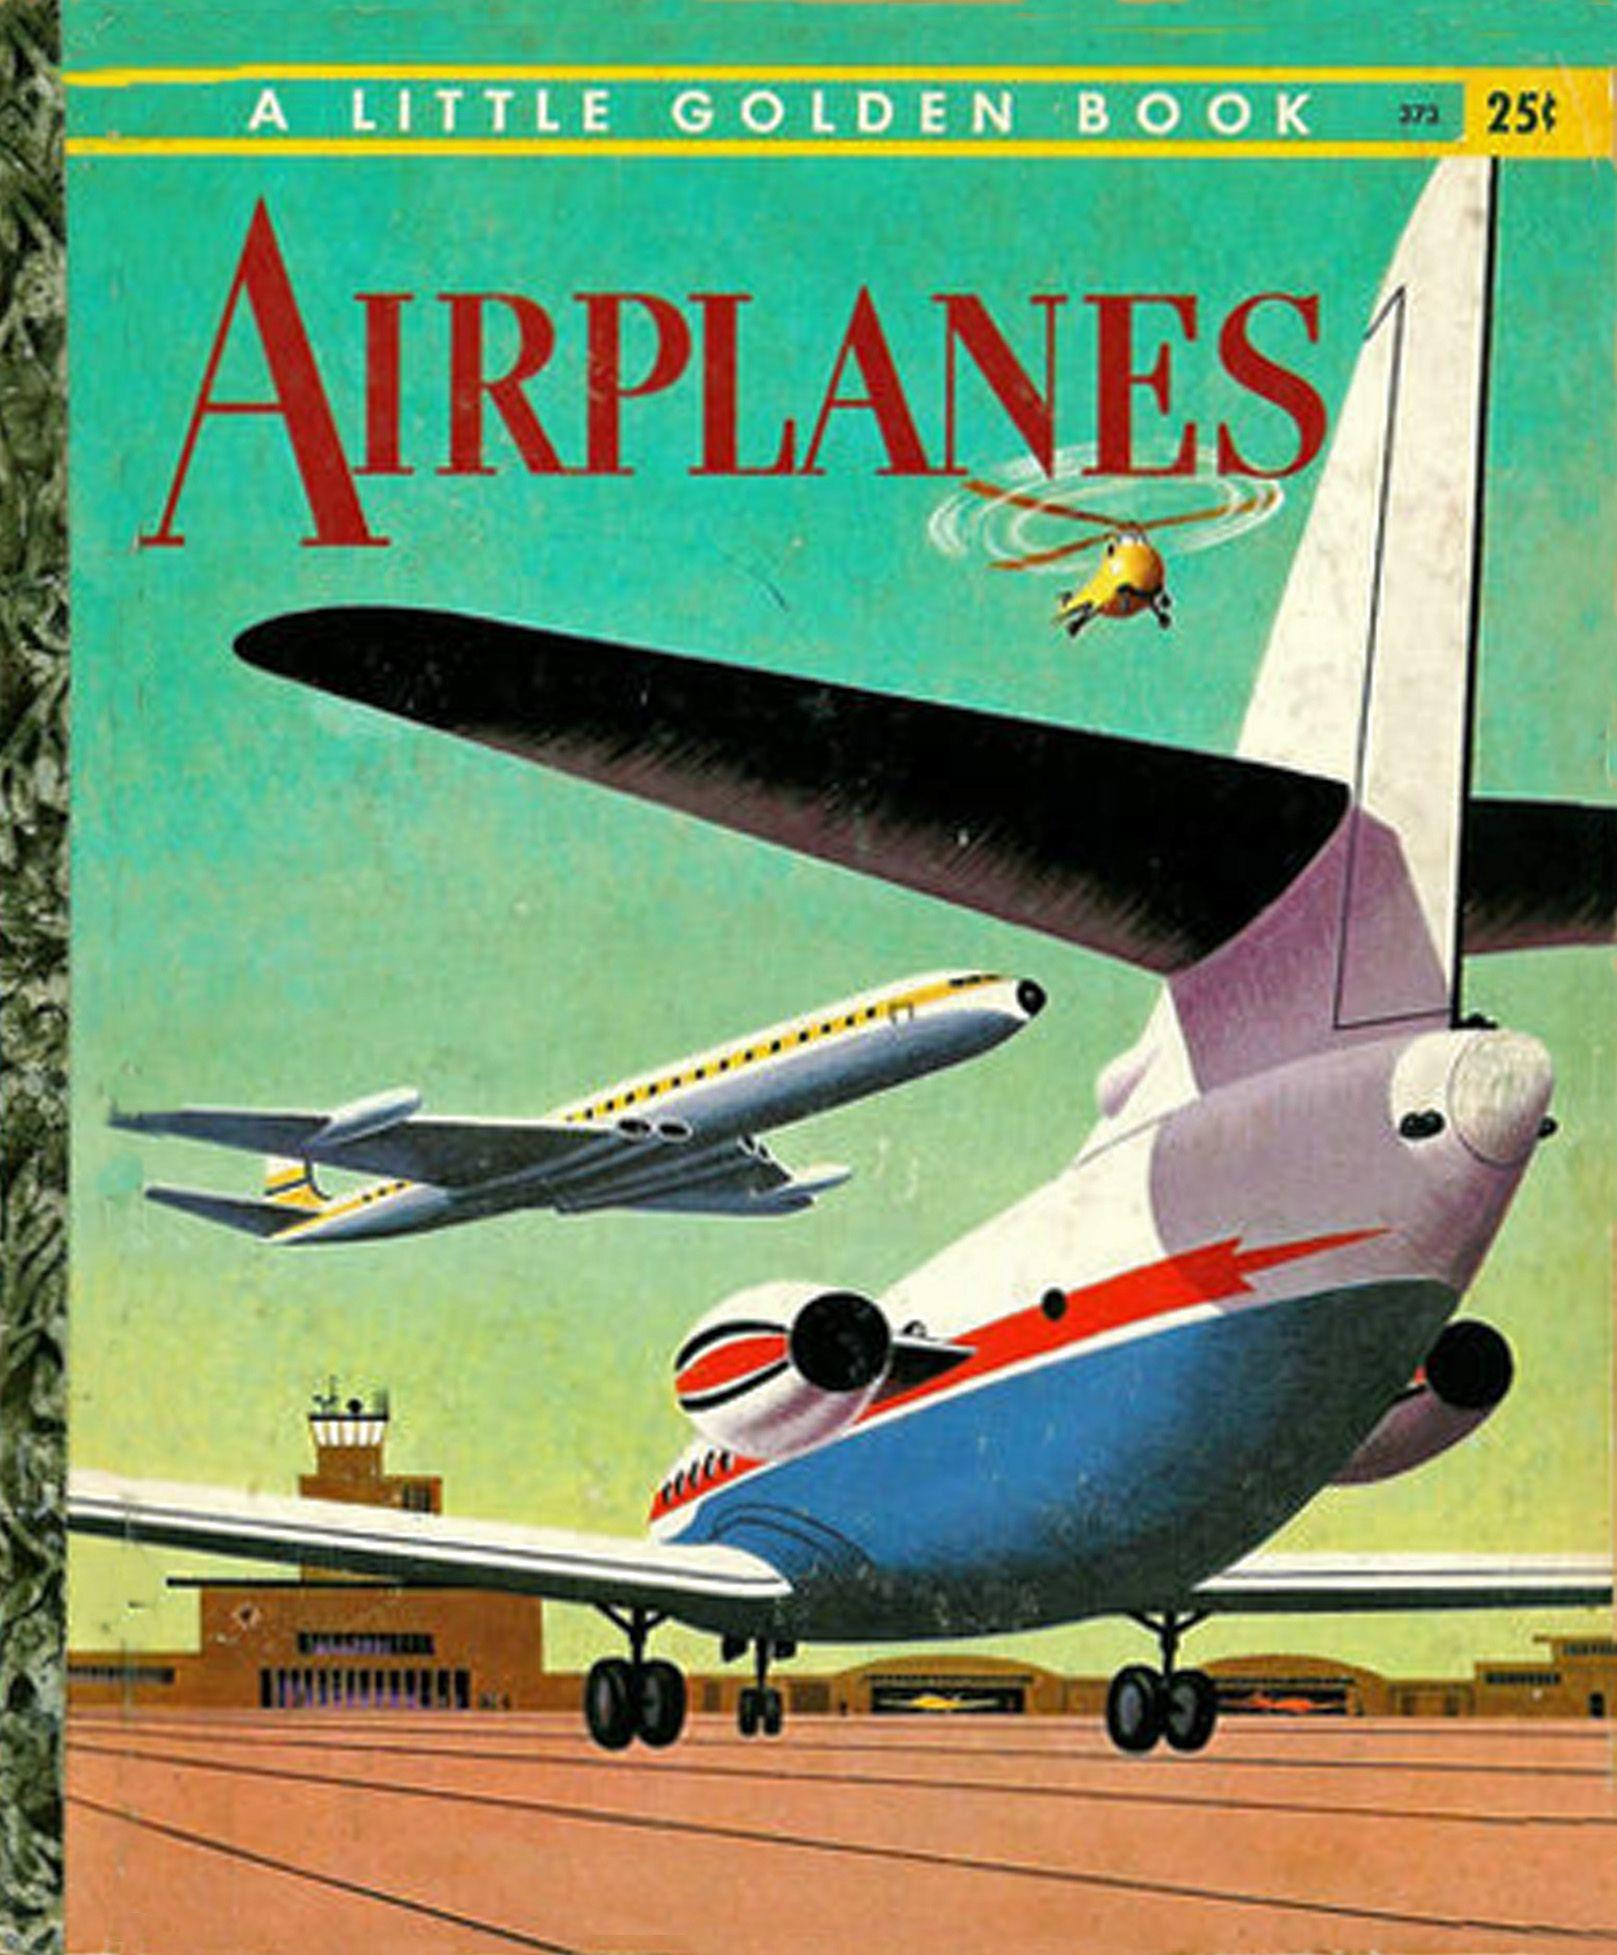 Airplanes - Little Golden Book